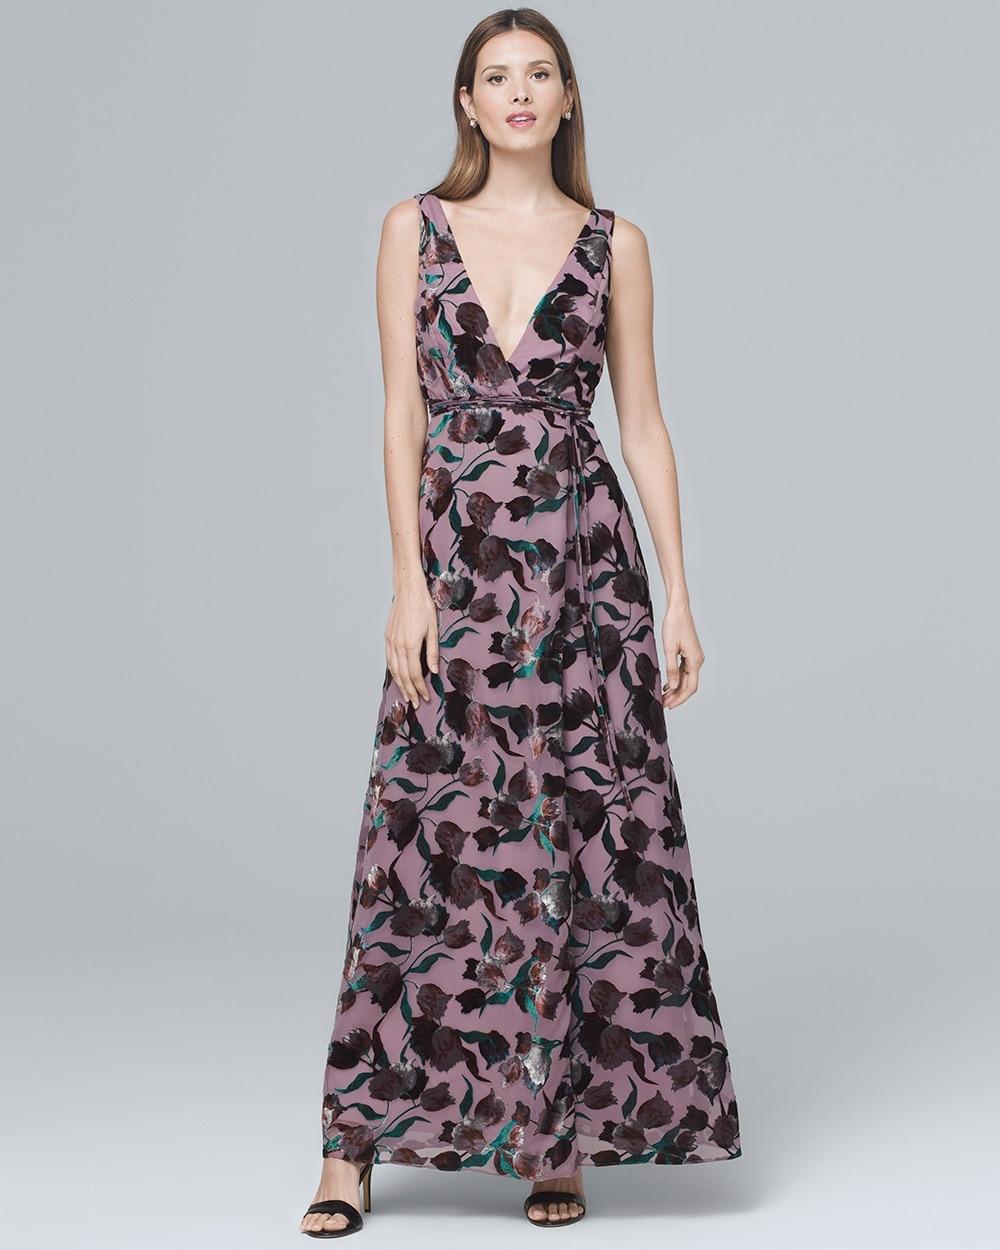 Velvet Burnout Wrap Gown - White House Black Market